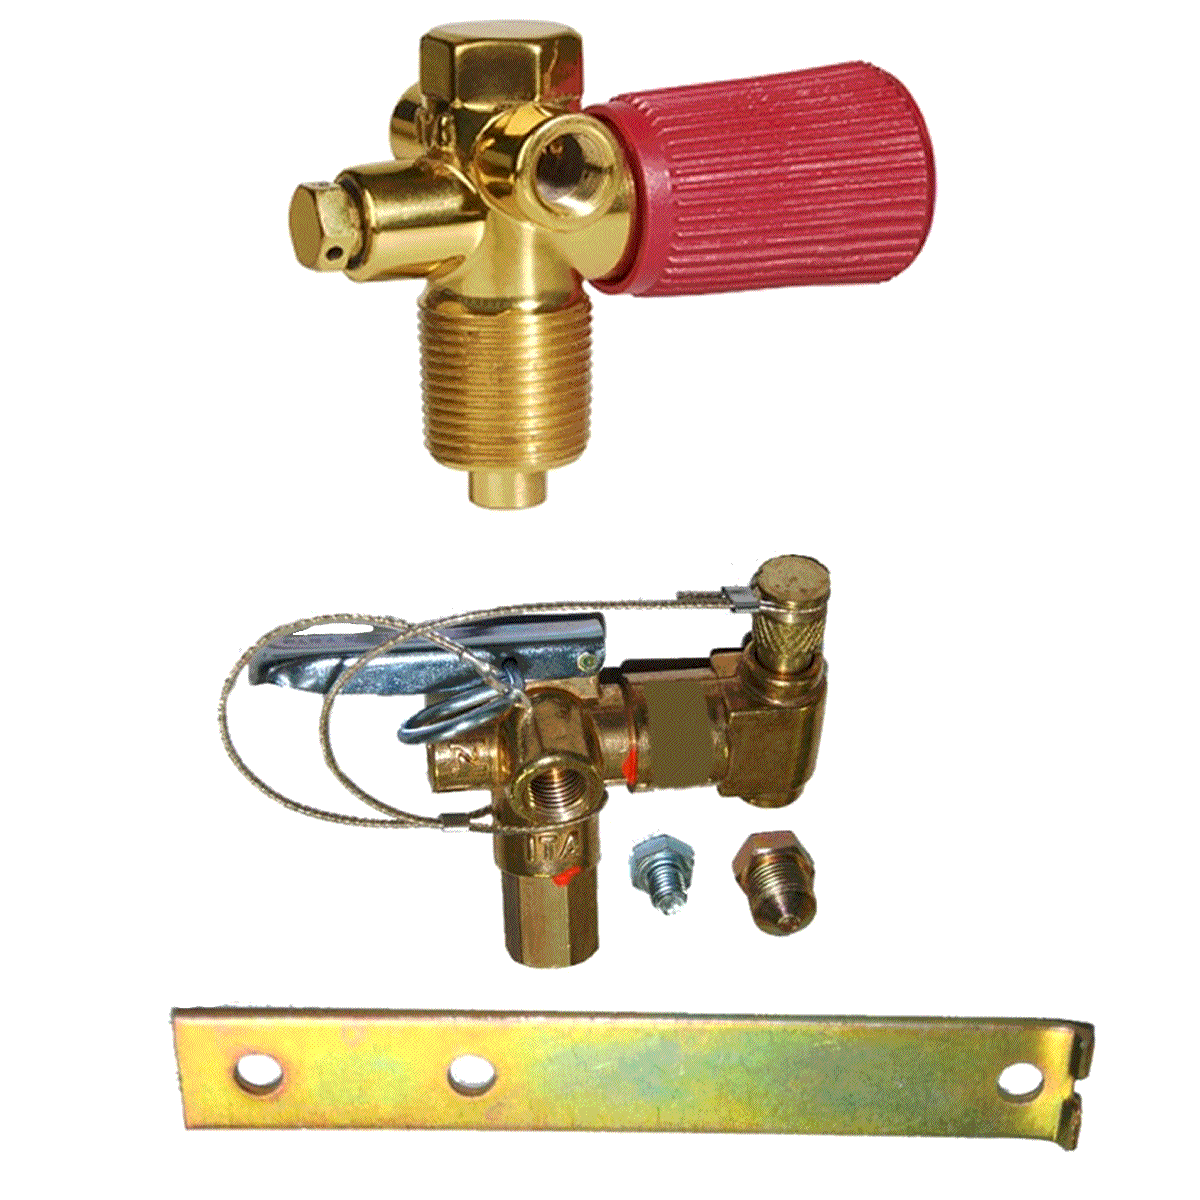 Kit GNV 3ª geração Lovato Flex TURY c/Variador, Válvulas ITA